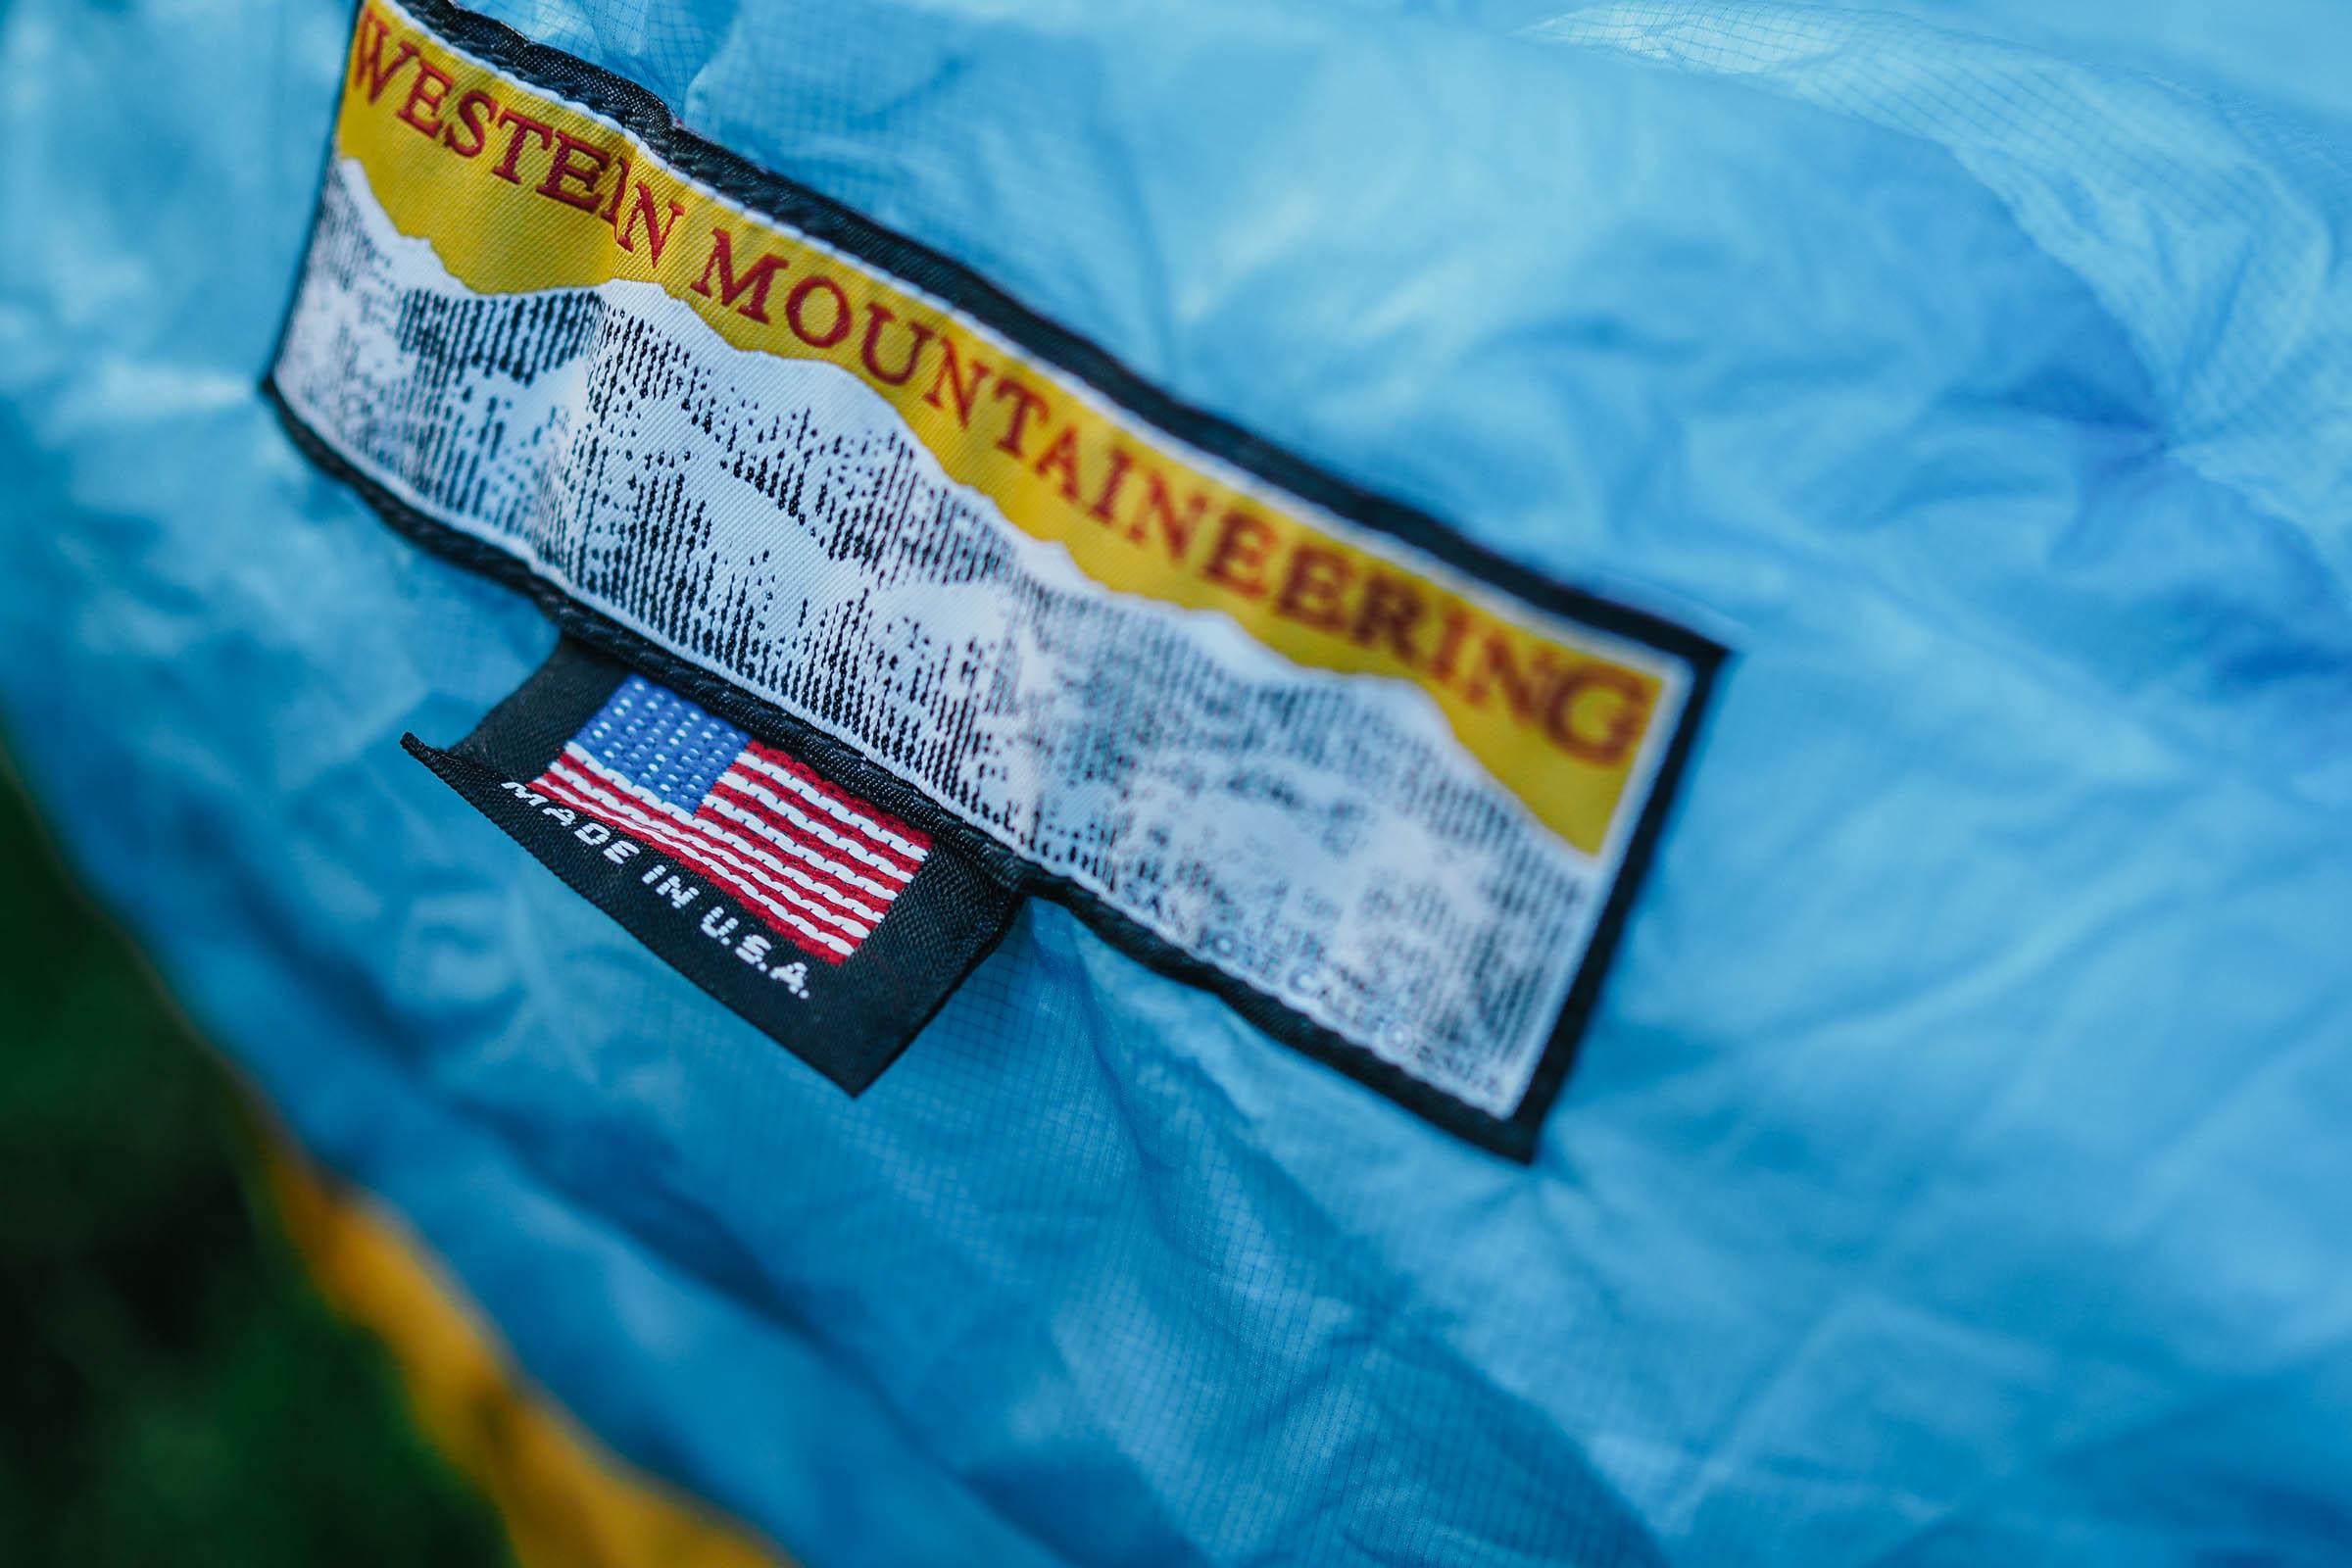 56e6d849610 Western Mountaineering NanoLite Quilt Review   Outsiding